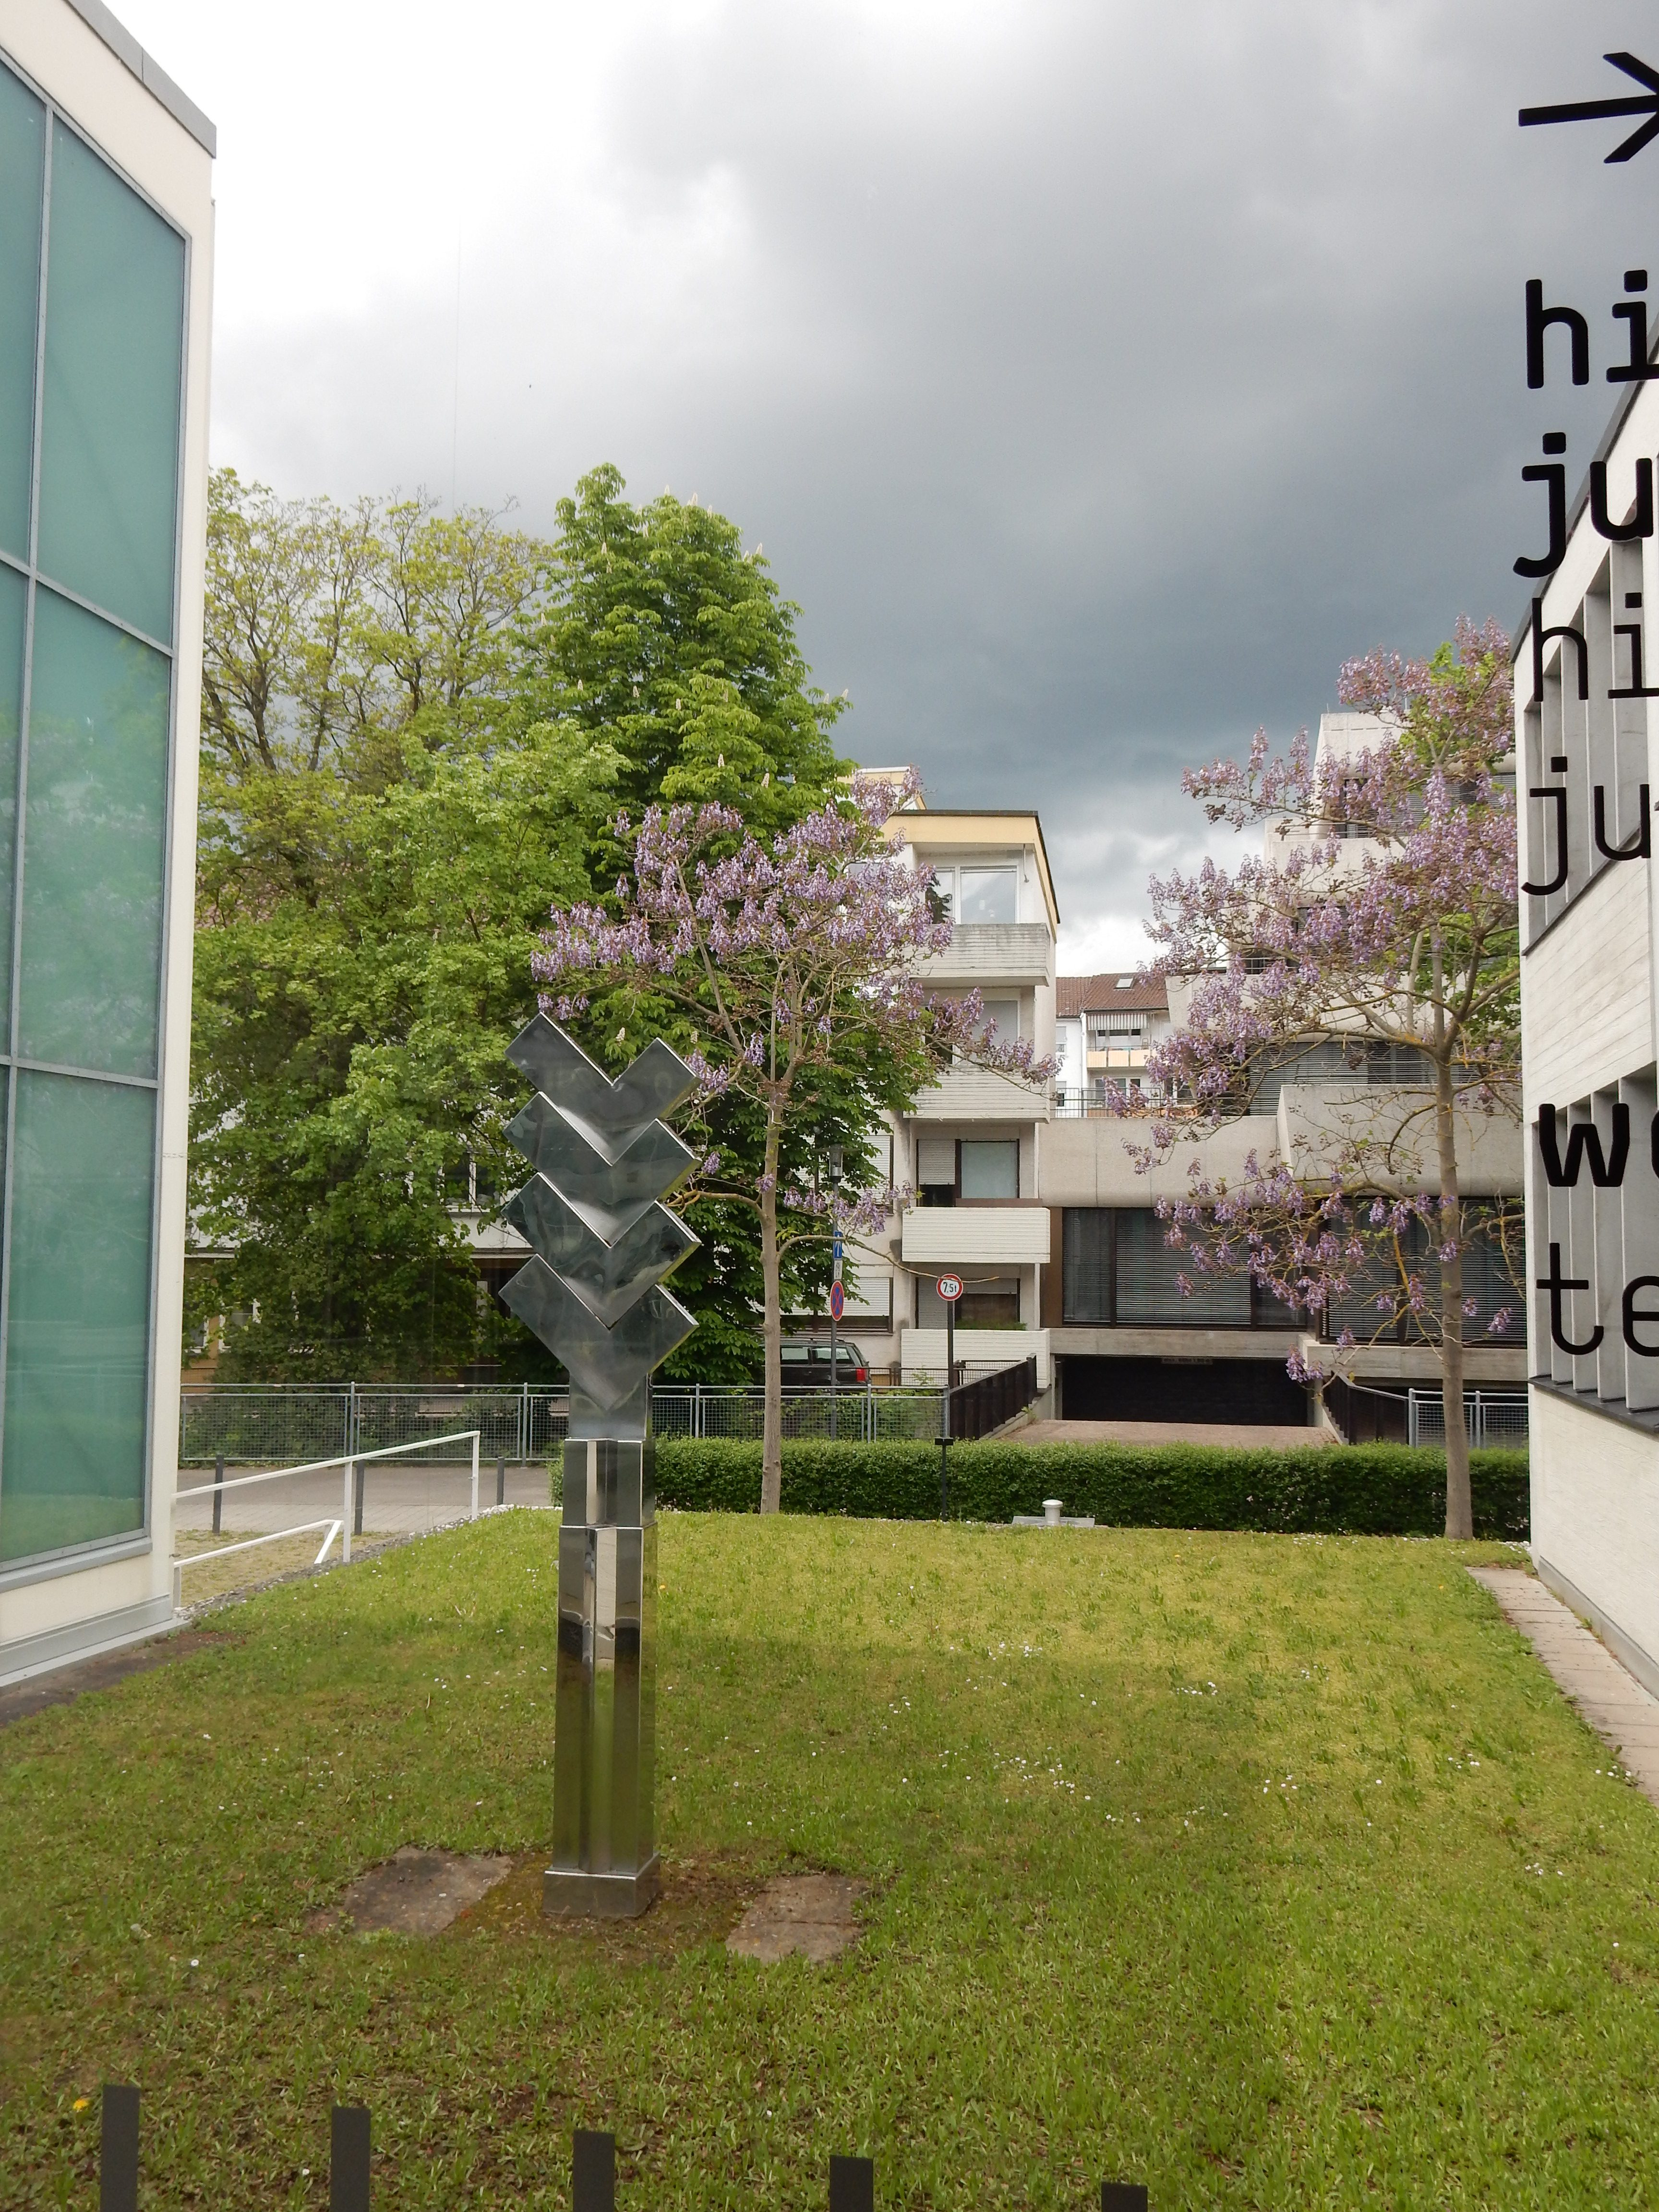 Schmuckmuseum Pforzheim, 11 mei 2019. Foto Coert Peter Krabbe, tuin, gevel, exterieur